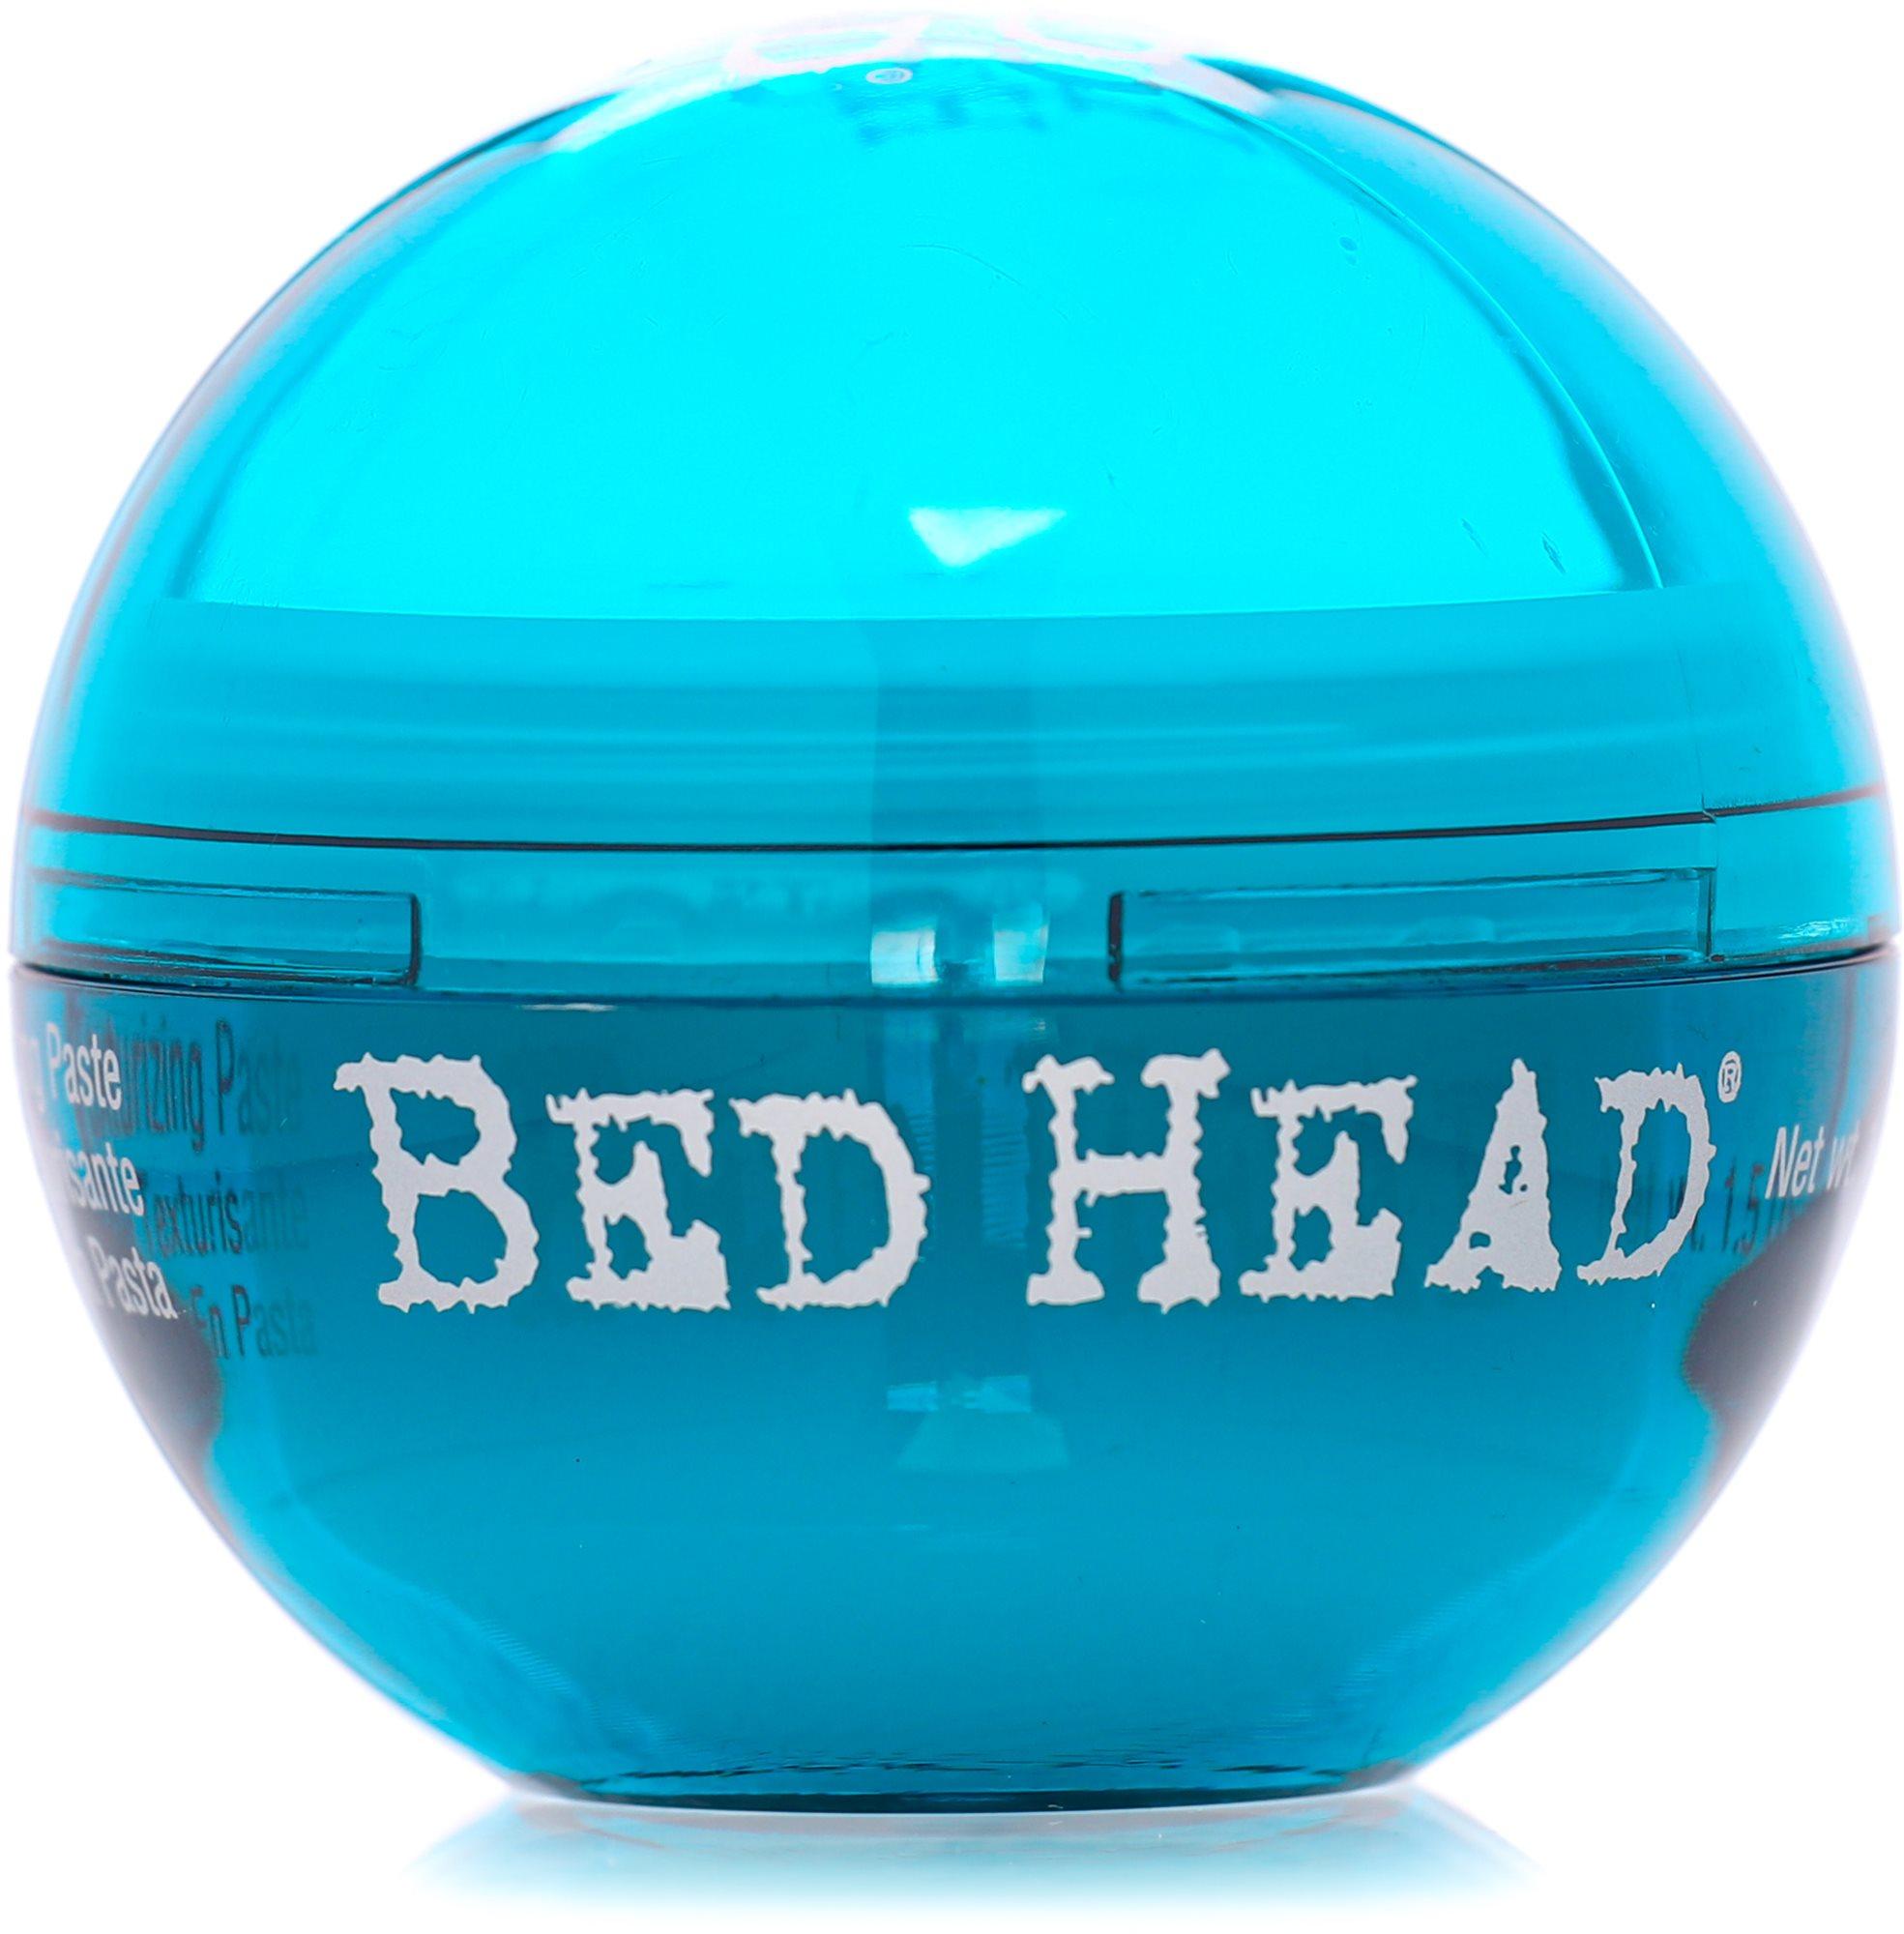 TIGI Bed Head Hard to Get Texturising Paste 42 ml